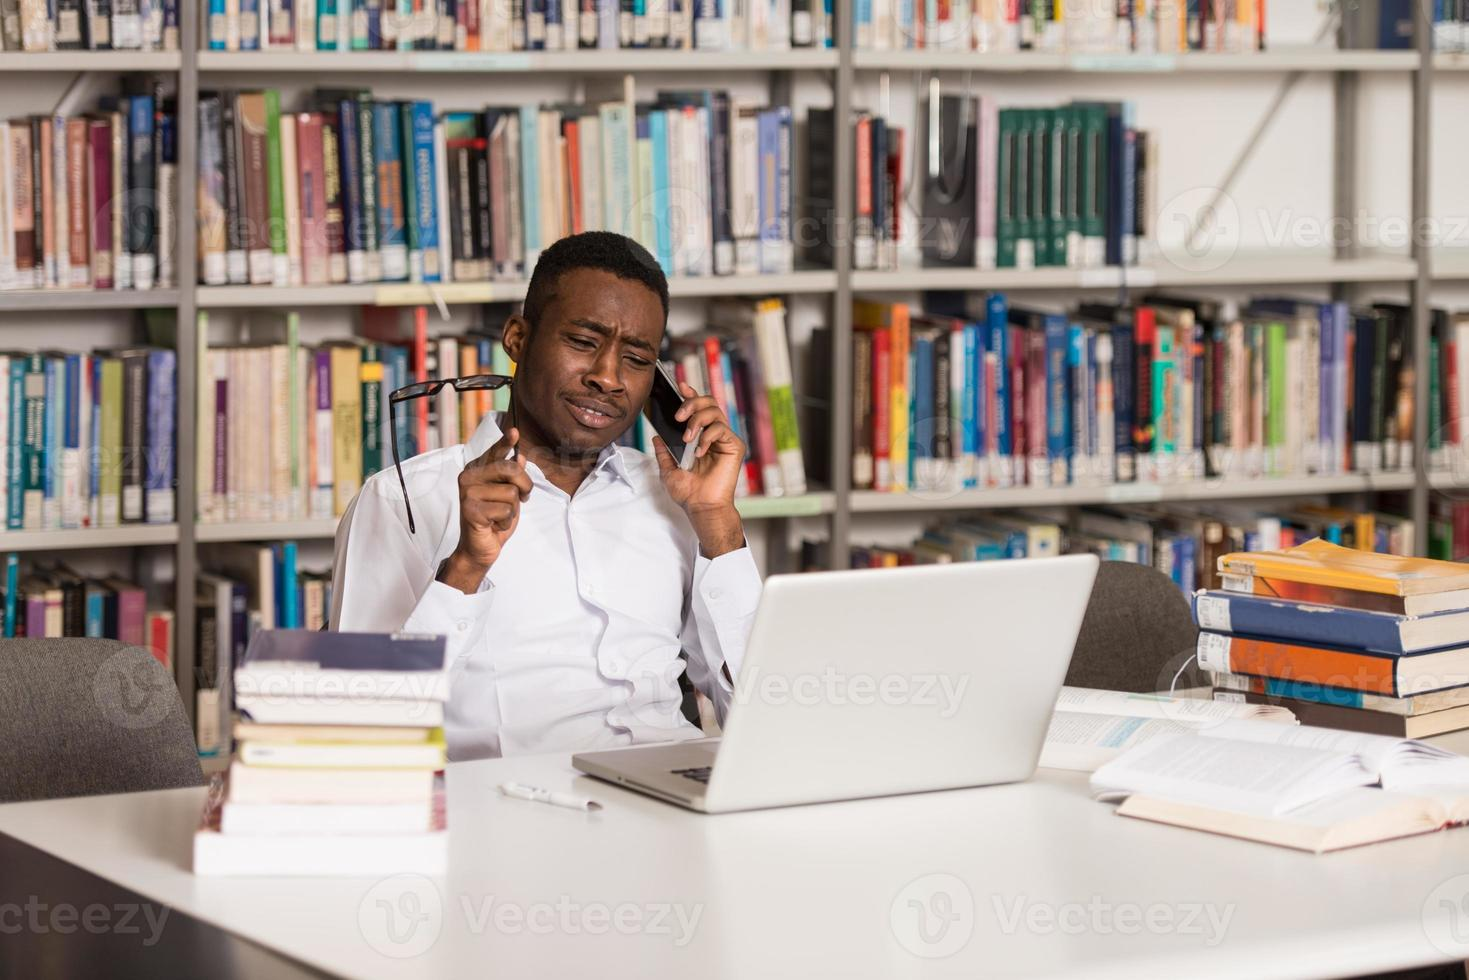 studente maschio parlando al telefono in biblioteca foto